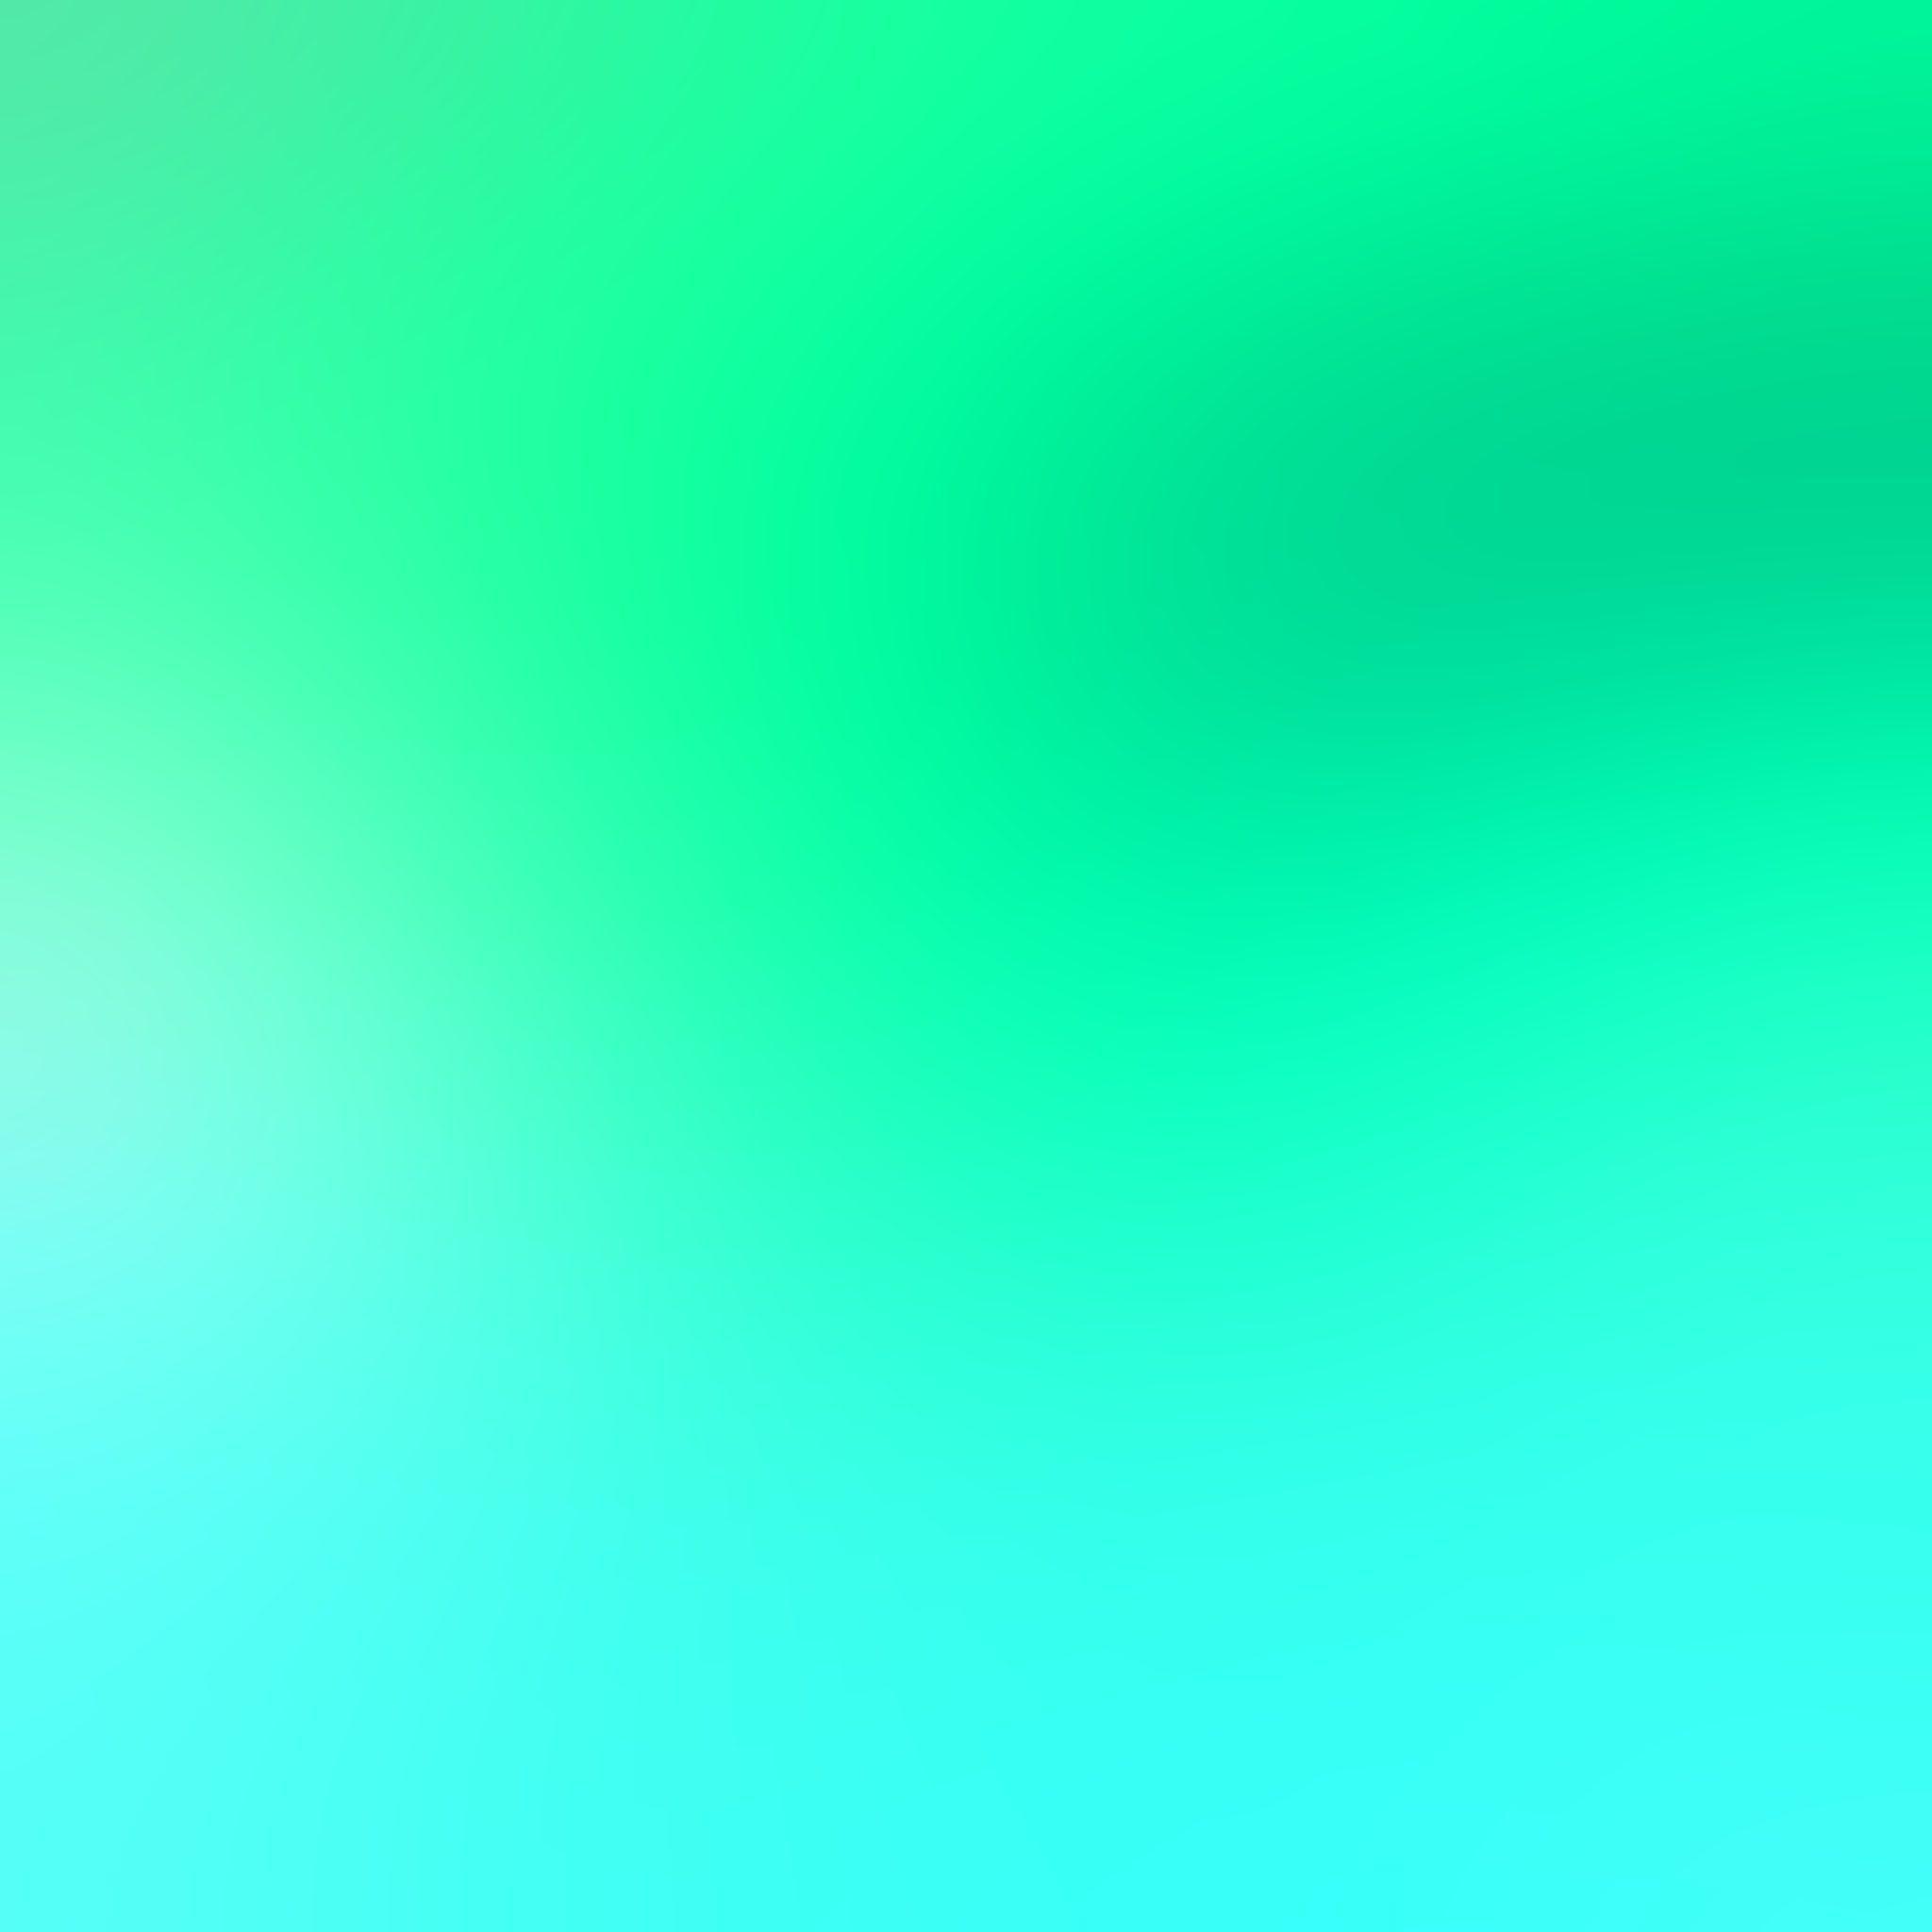 green neon background - photo #34